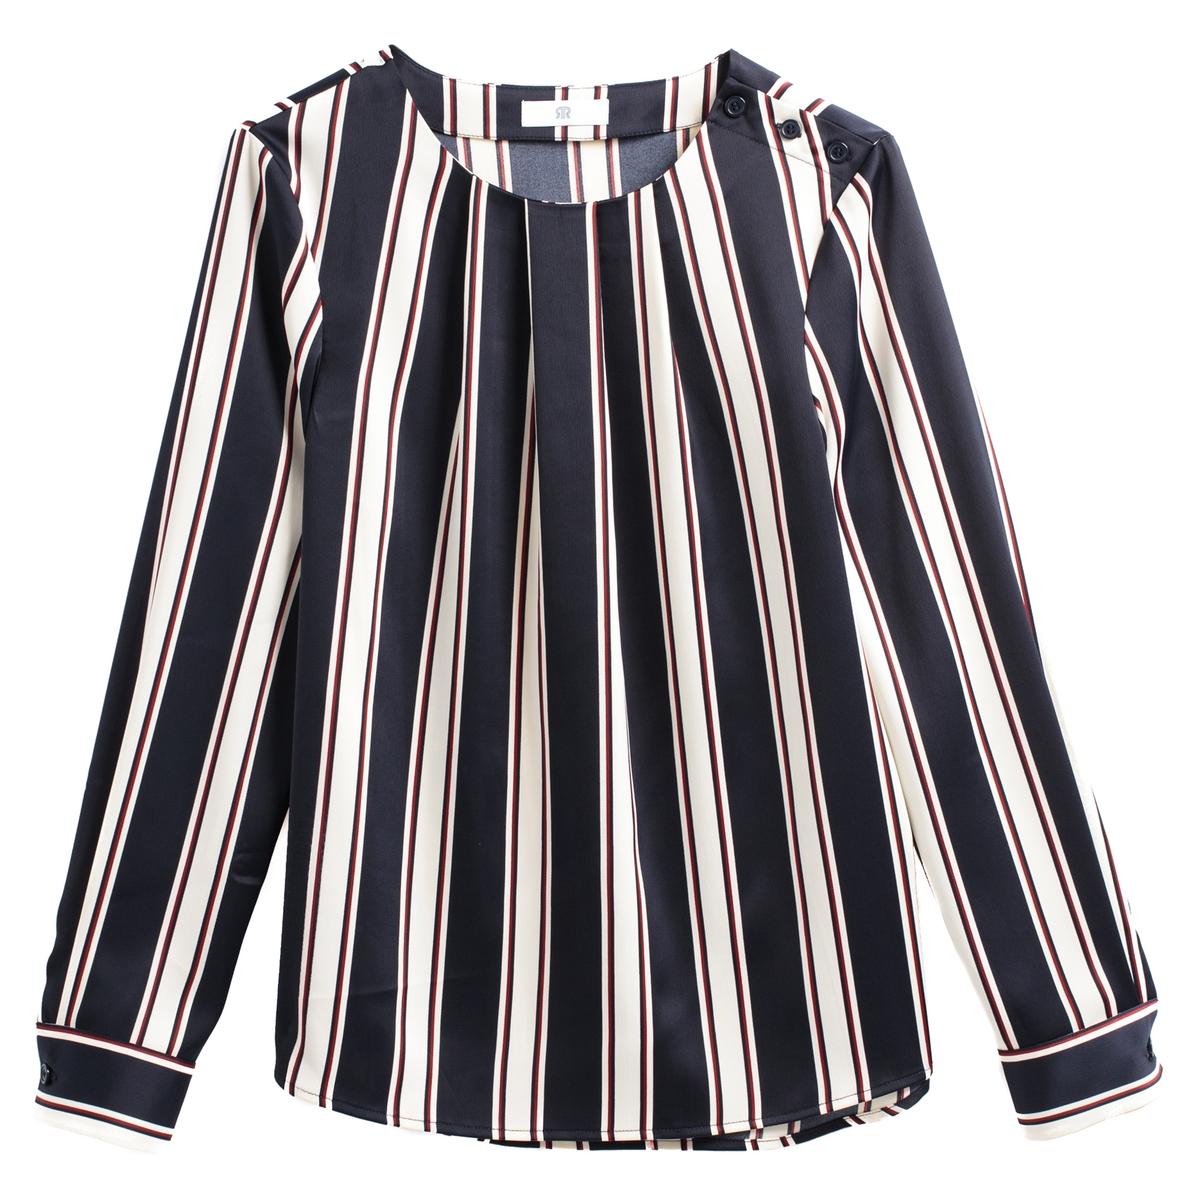 Blusa a rayas gráficas de manga larga y cuello redondo